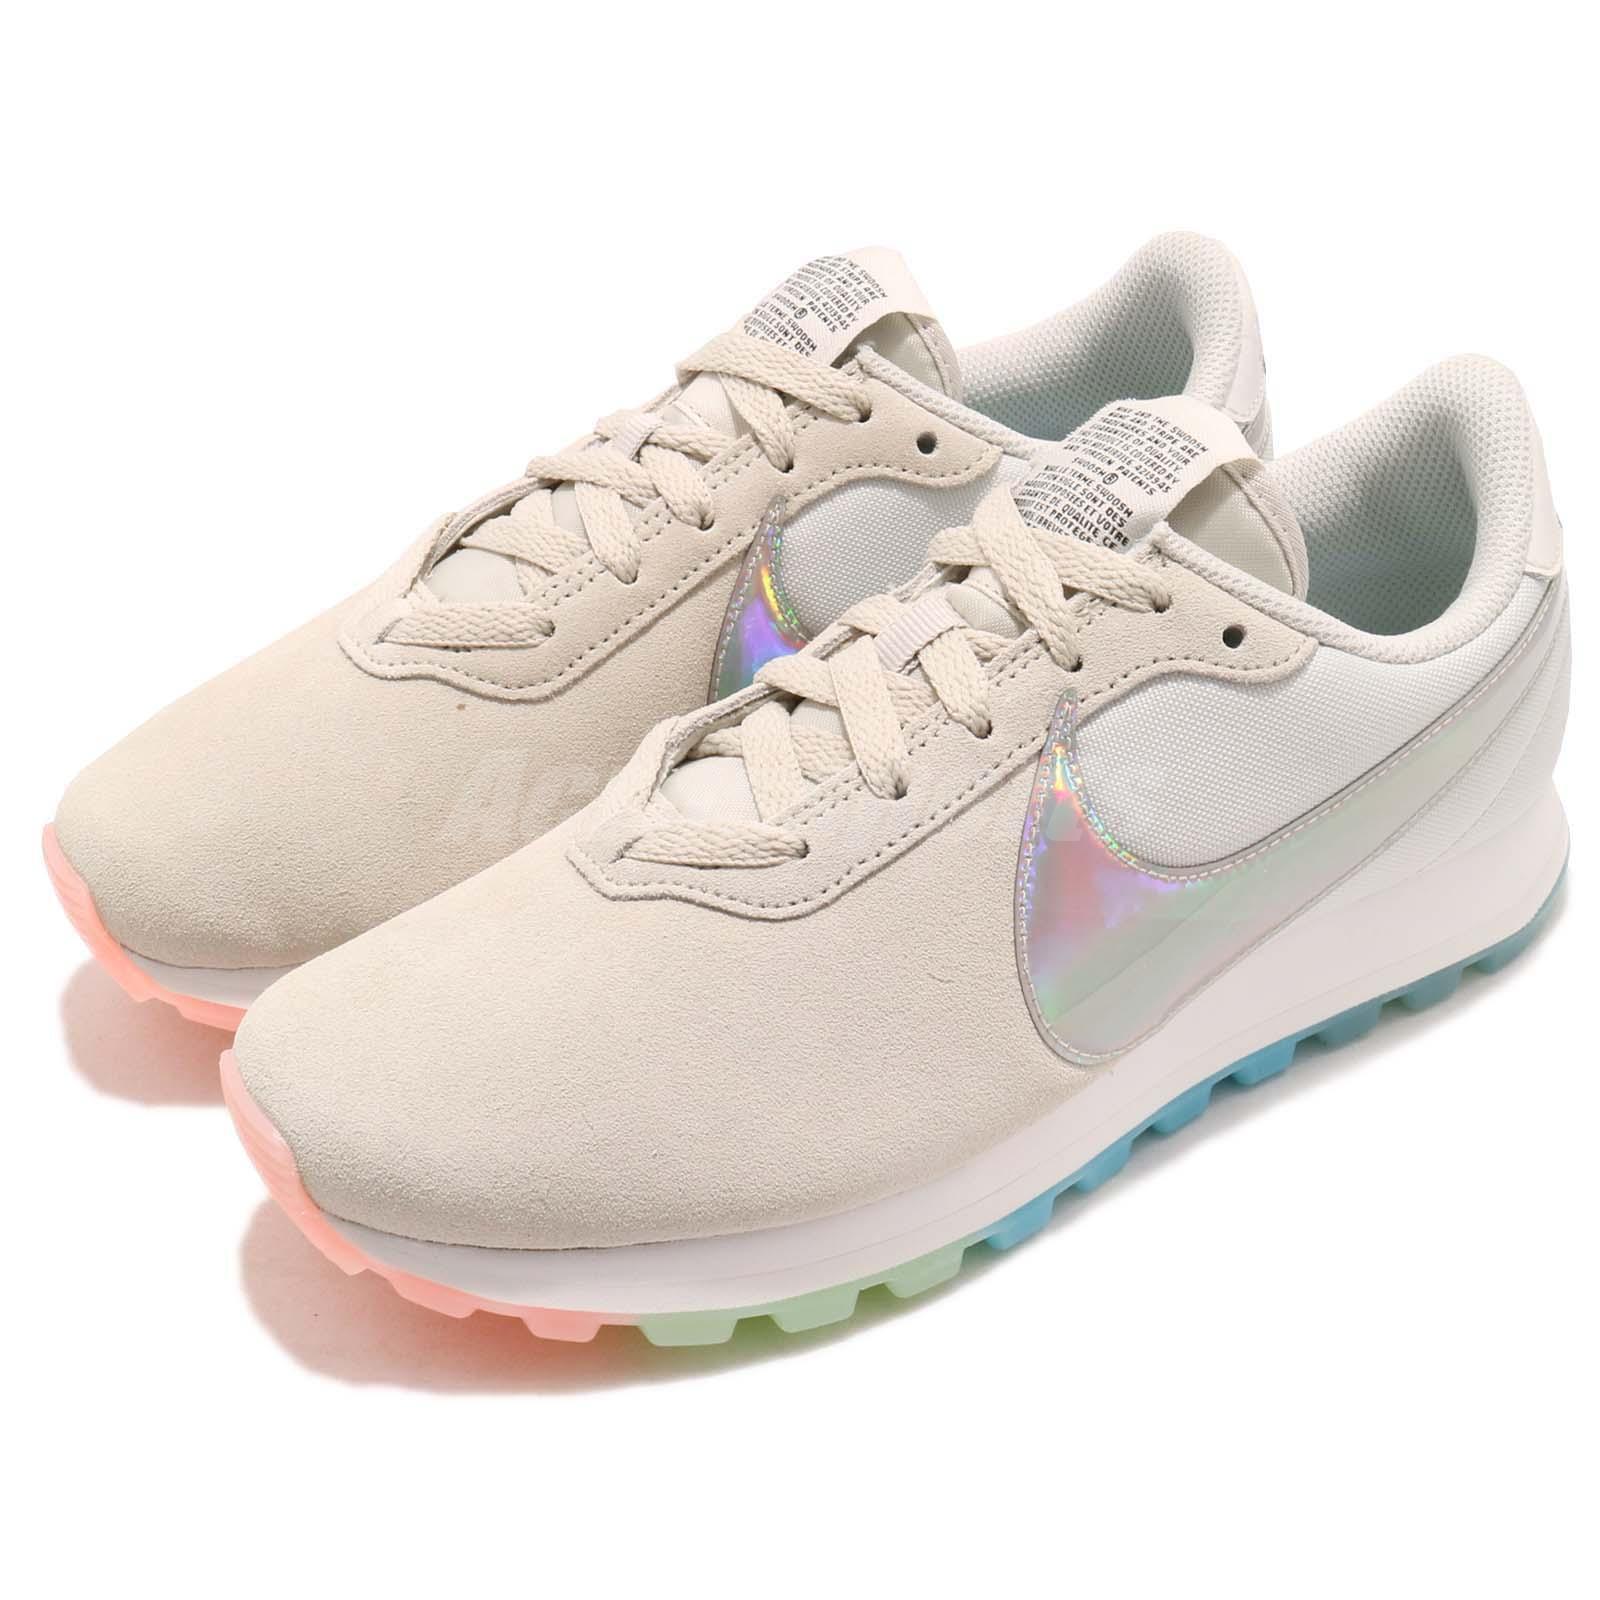 Nike Wmns Nike Pre-Love O.X. Rainbow Iridescent Summit Blanc Femme AO3166-100